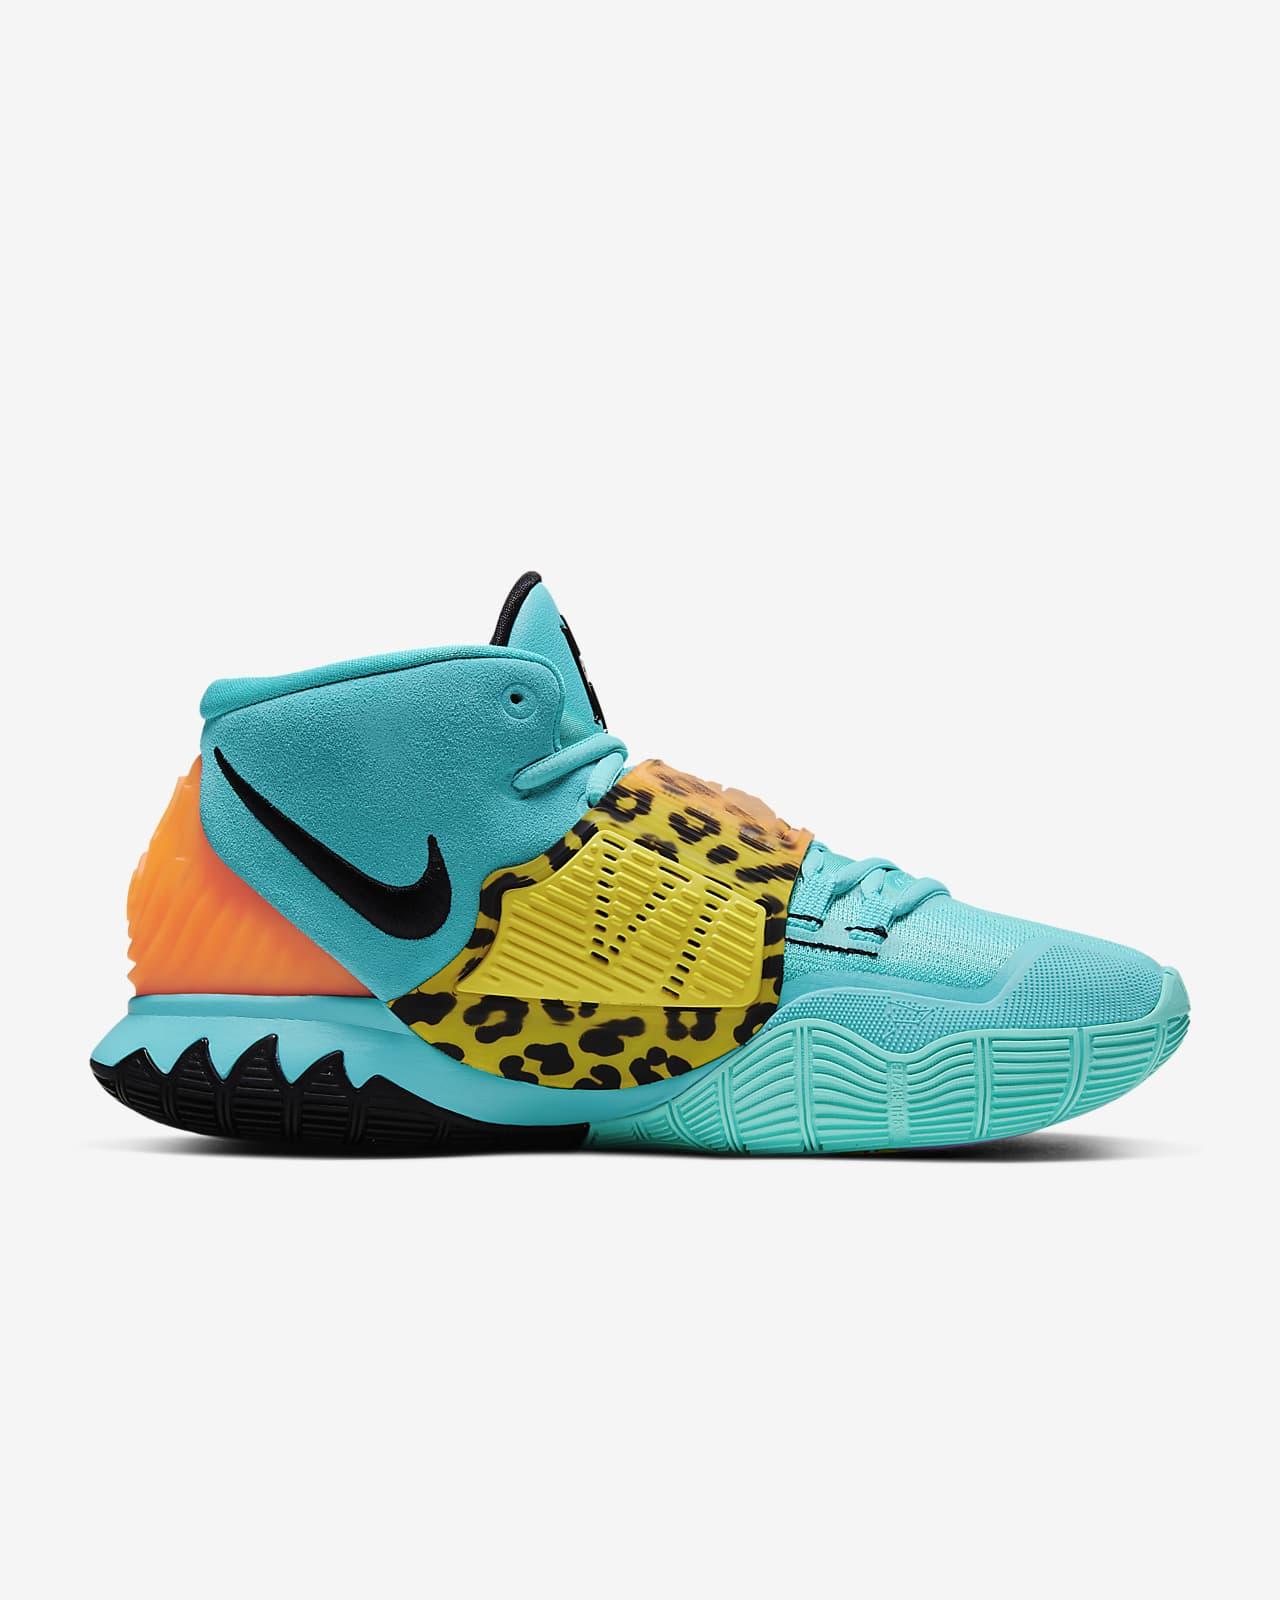 Kyrie 6 Basketball Shoe. Nike BG